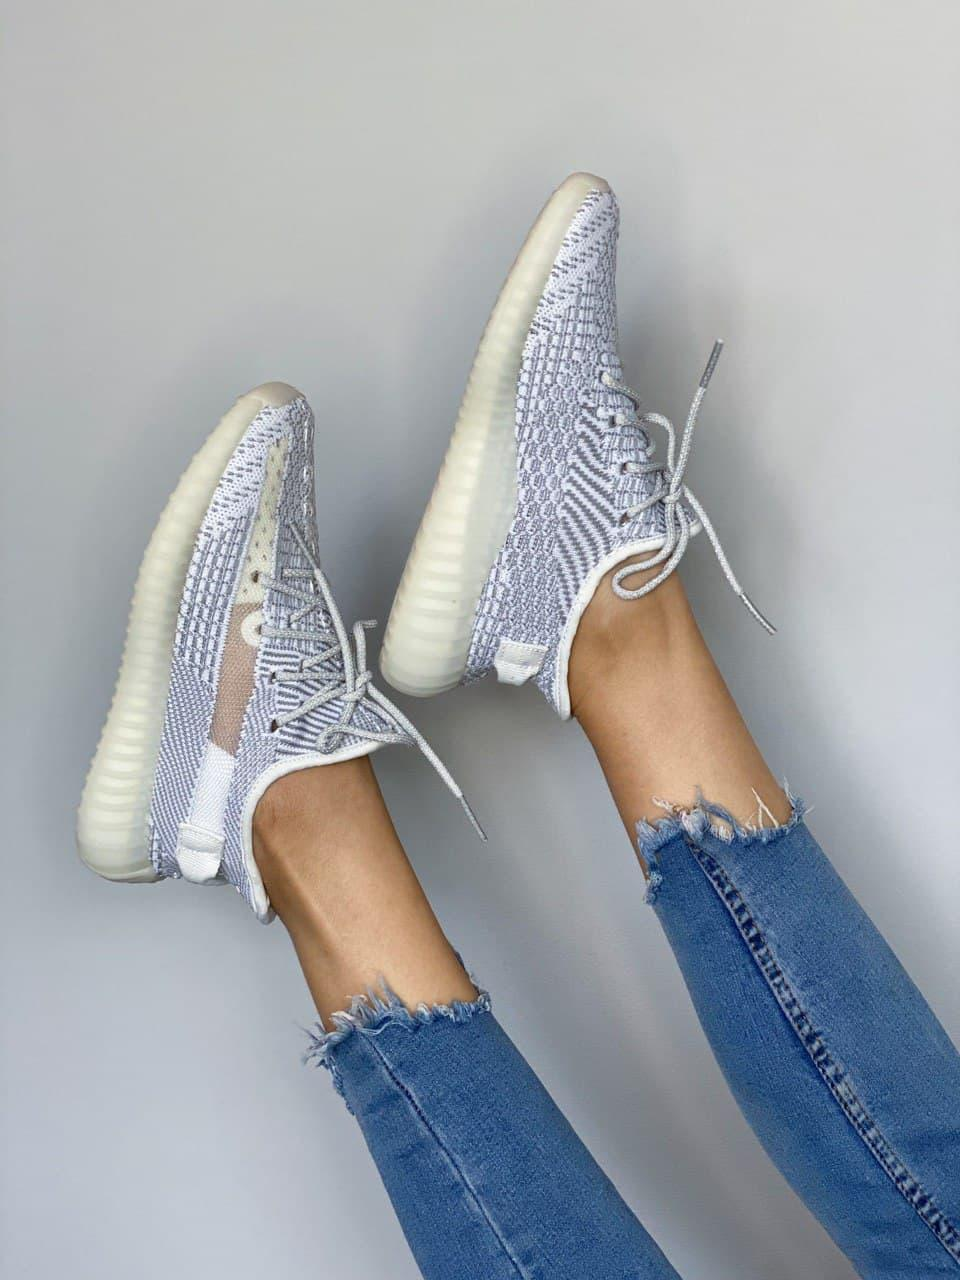 Женские кроссовки Adidas Yeezy 350 Static Reflective Laces